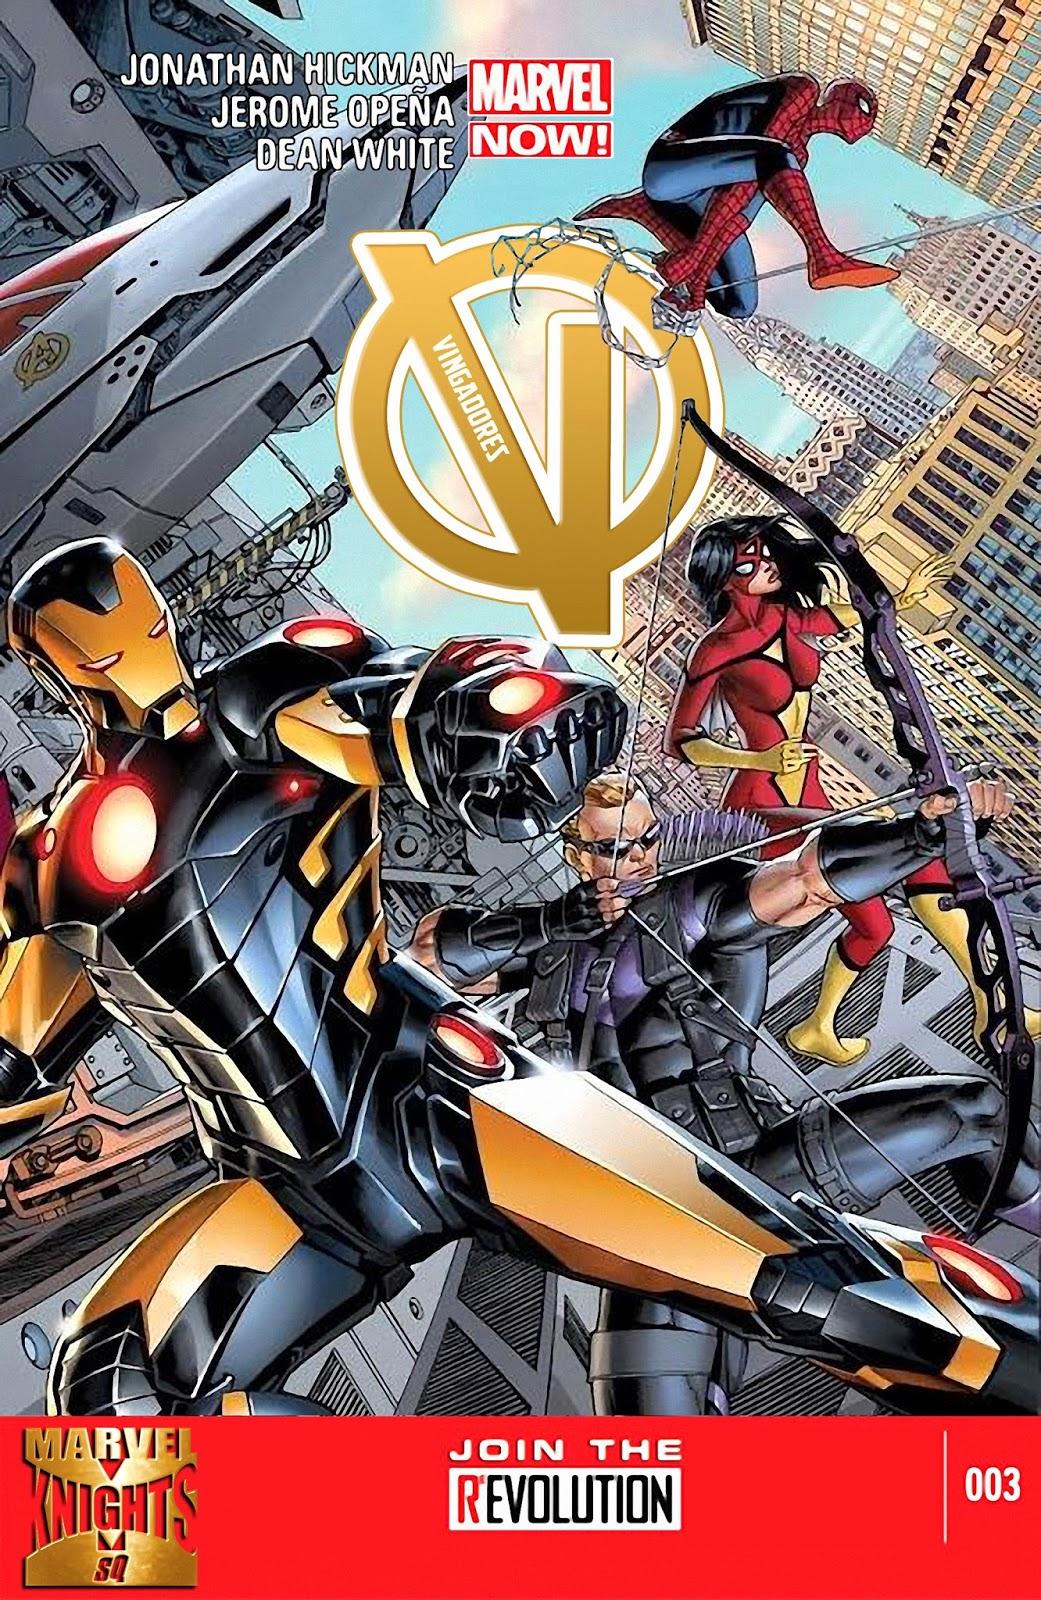 Nova Marvel! Vingadores #3